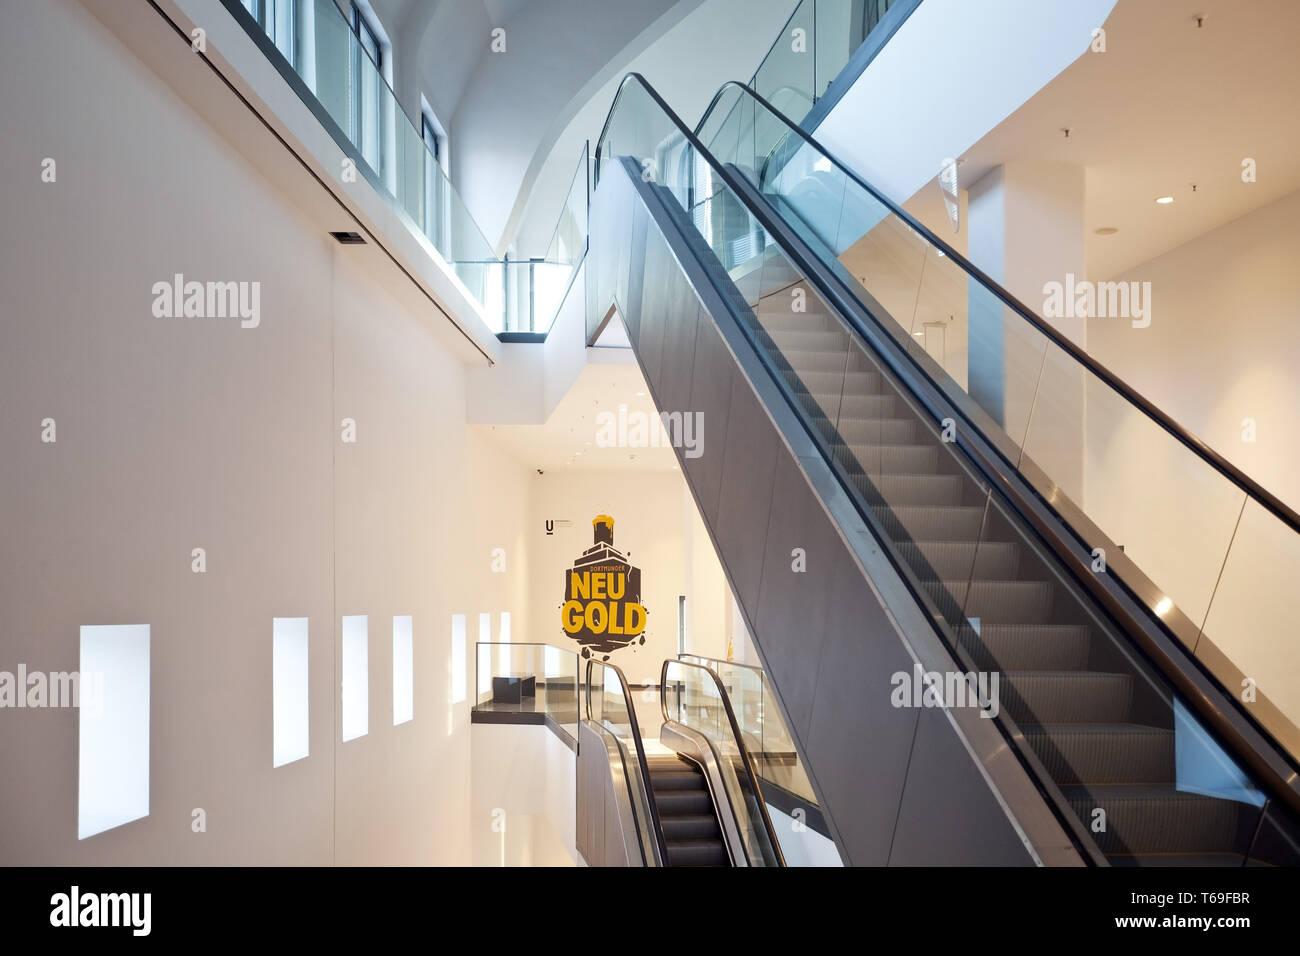 Staircase, Dortmunder U, Centre for Art and Creativity, Dortmund, Germany - Stock Image